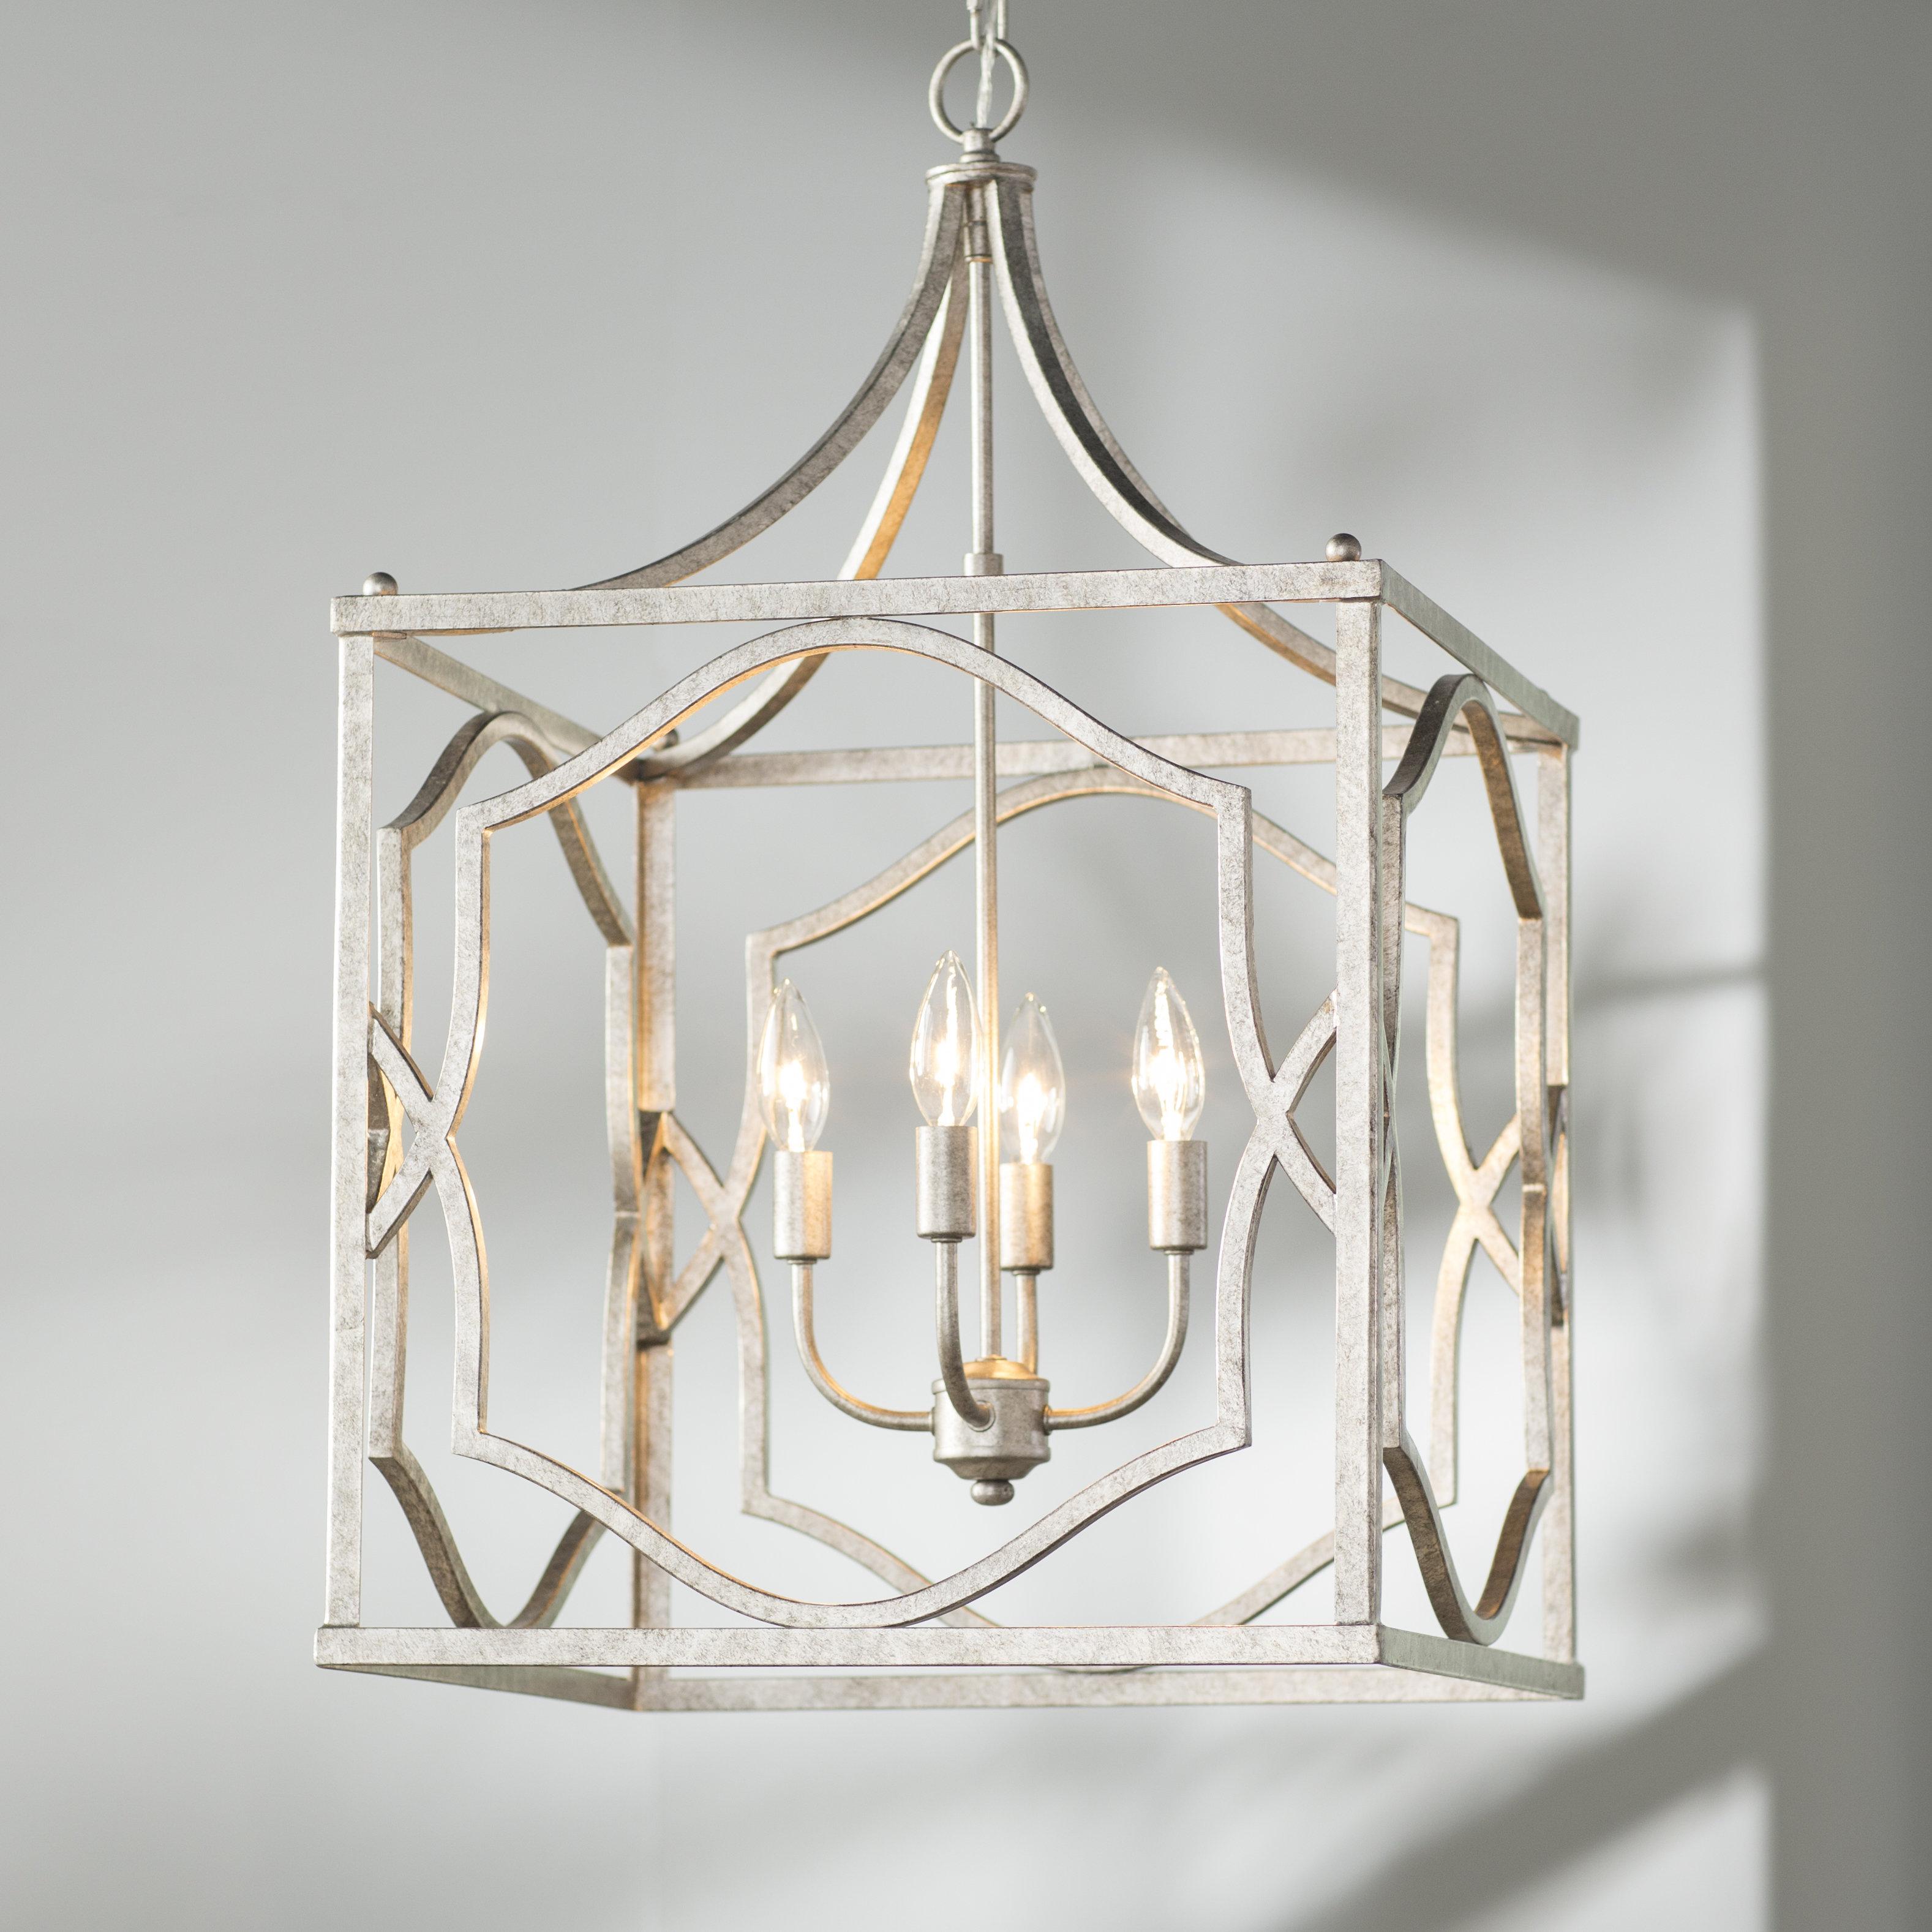 Destrey 4 Light Lantern Square / Rectangle Pendant Pertaining To 4 Light Lantern Square / Rectangle Pendants (View 11 of 30)